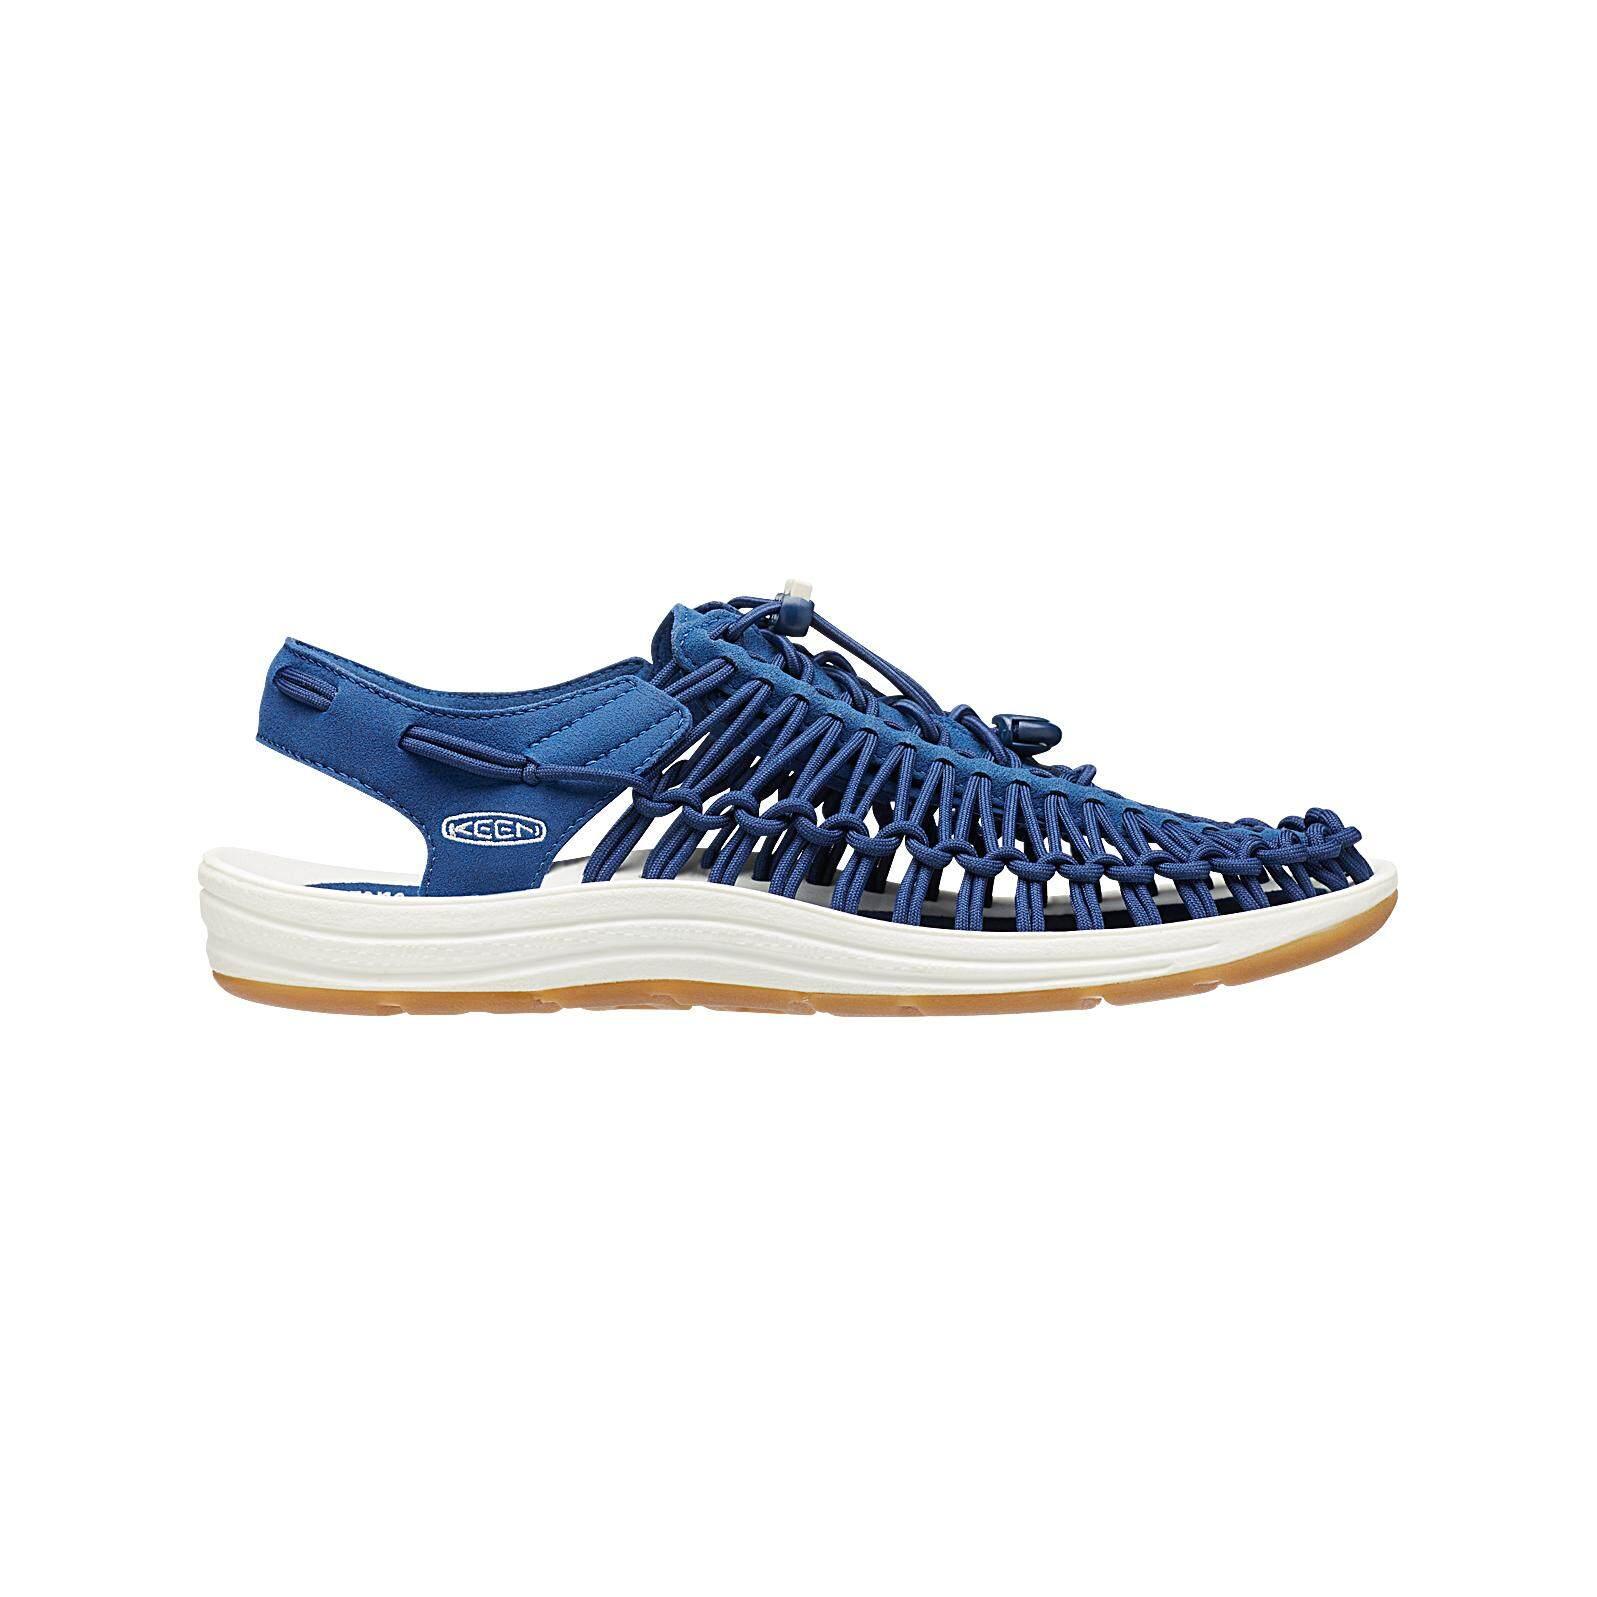 Keen รองเท้าผู้หญิง รุ่น UNEEK(ESTATE BLUE/WHITE)